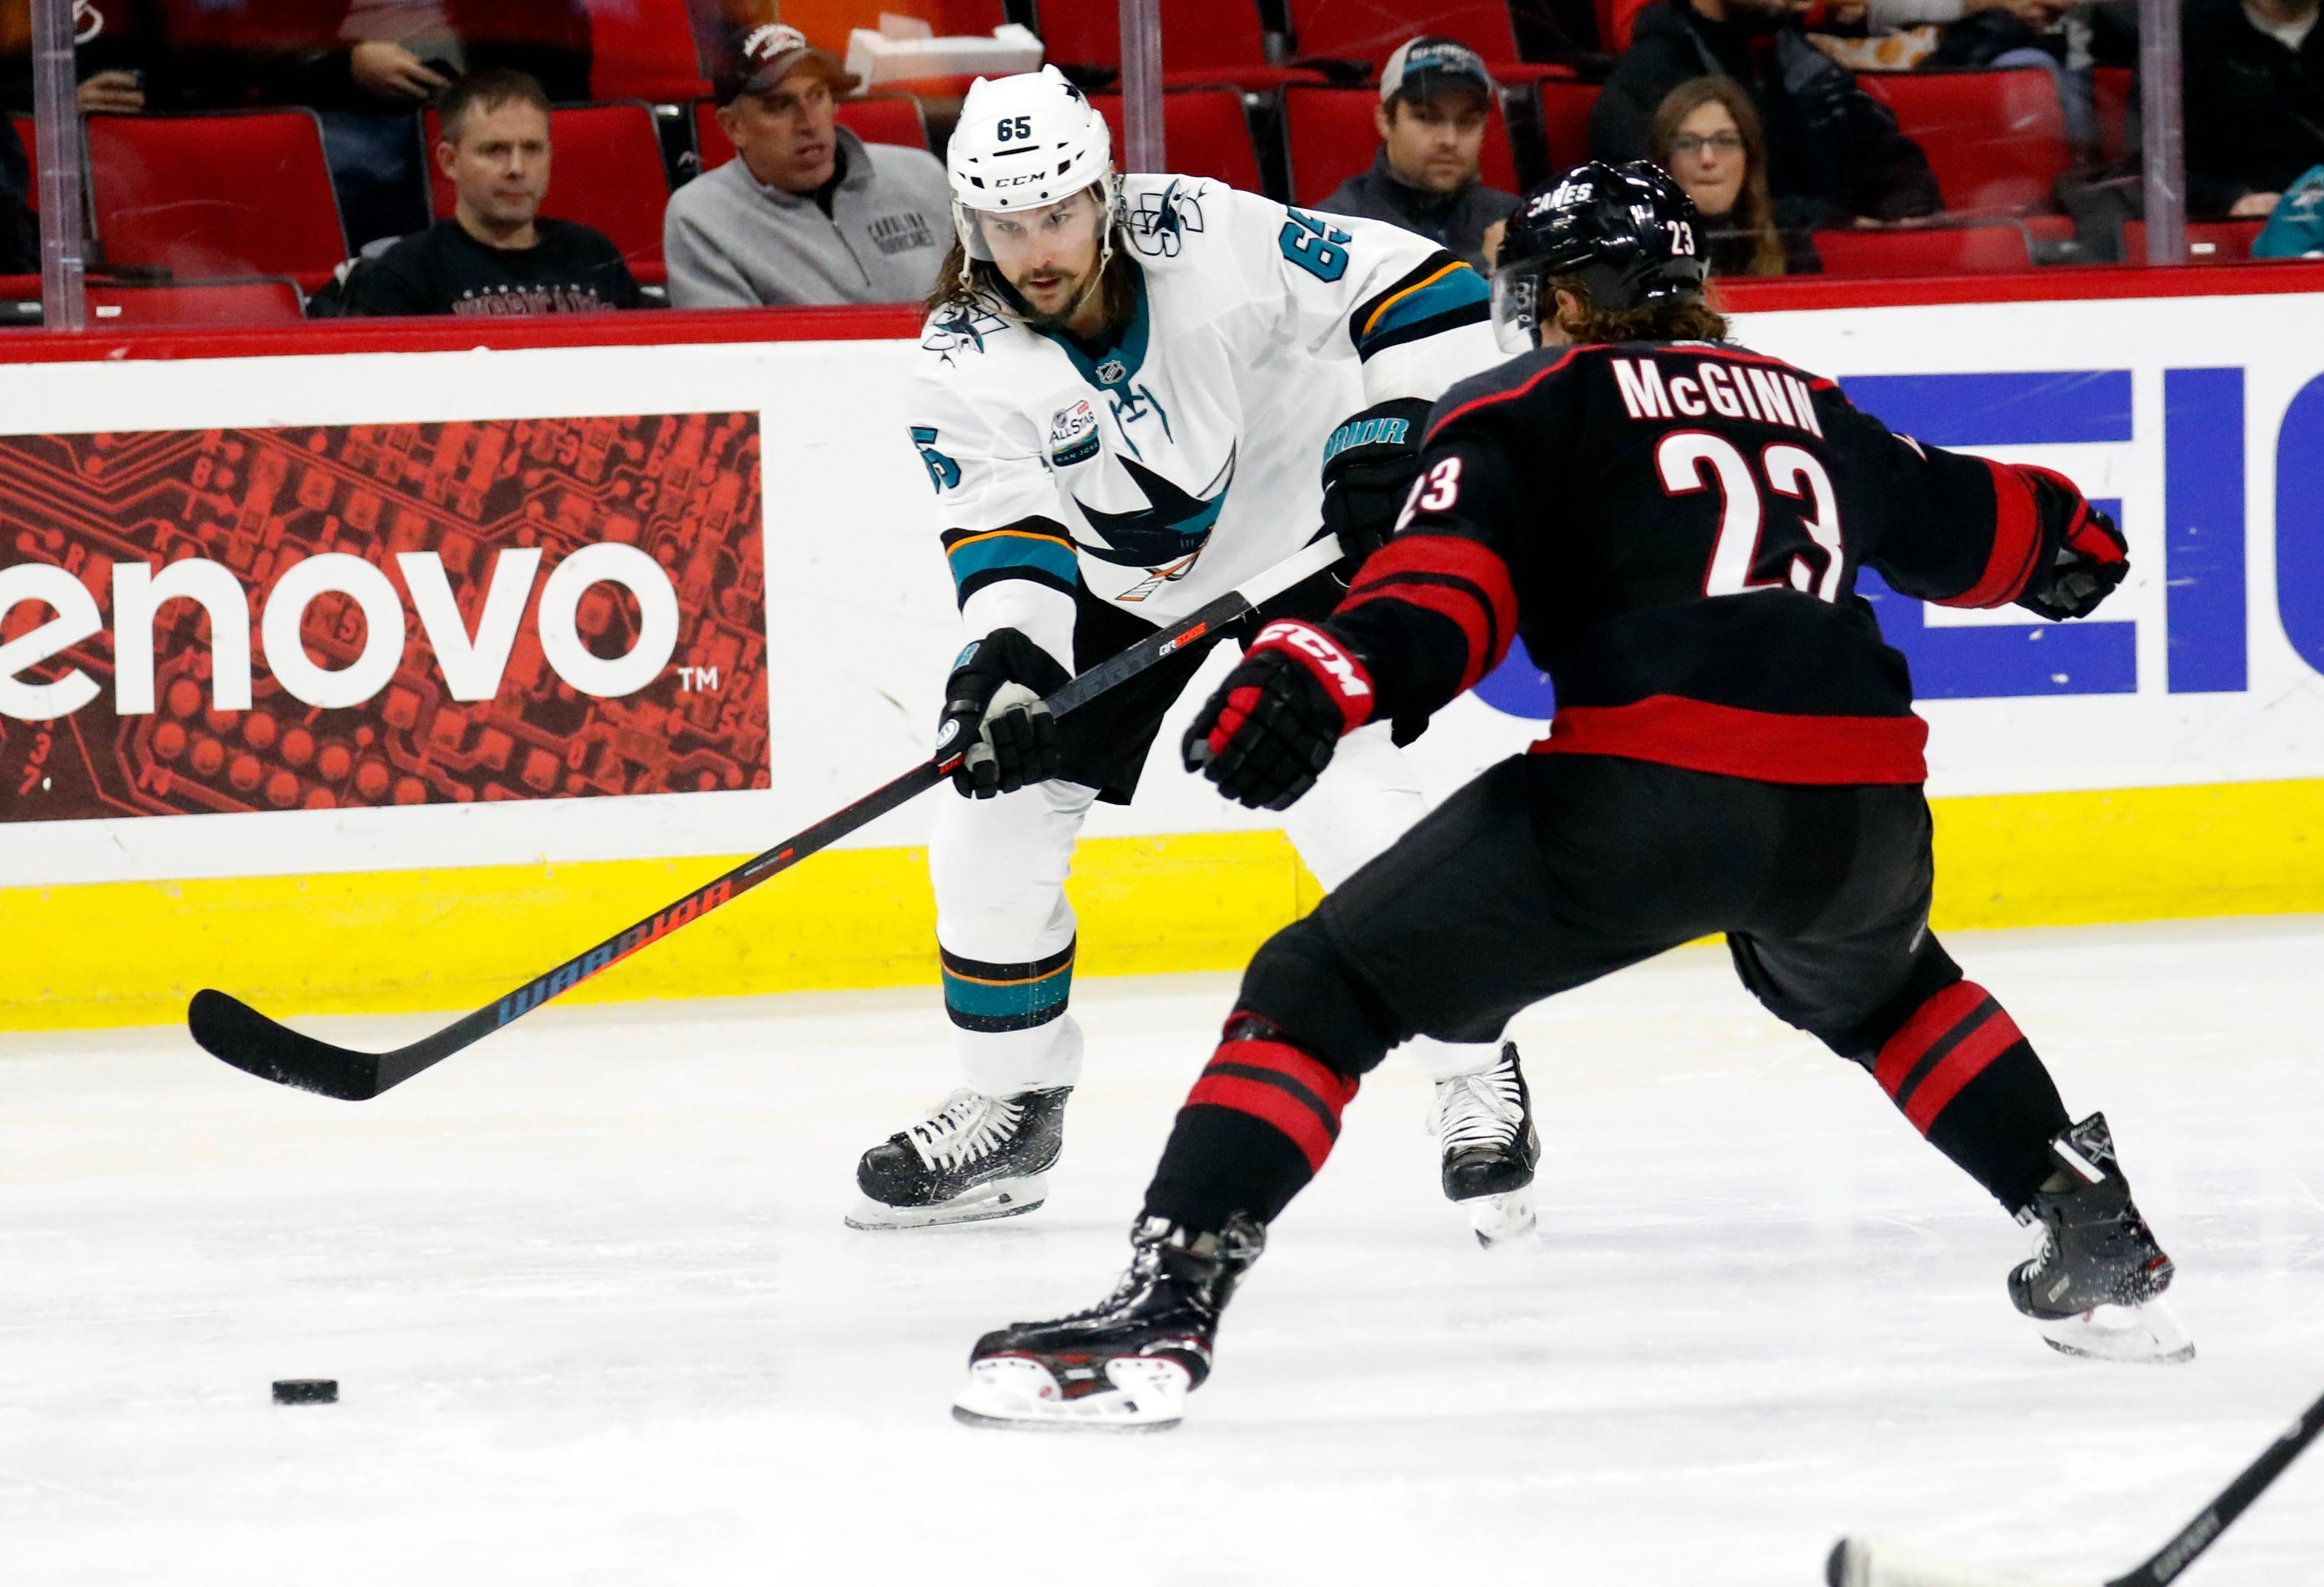 Injured Karlsson could still take part in All-Star Weekend